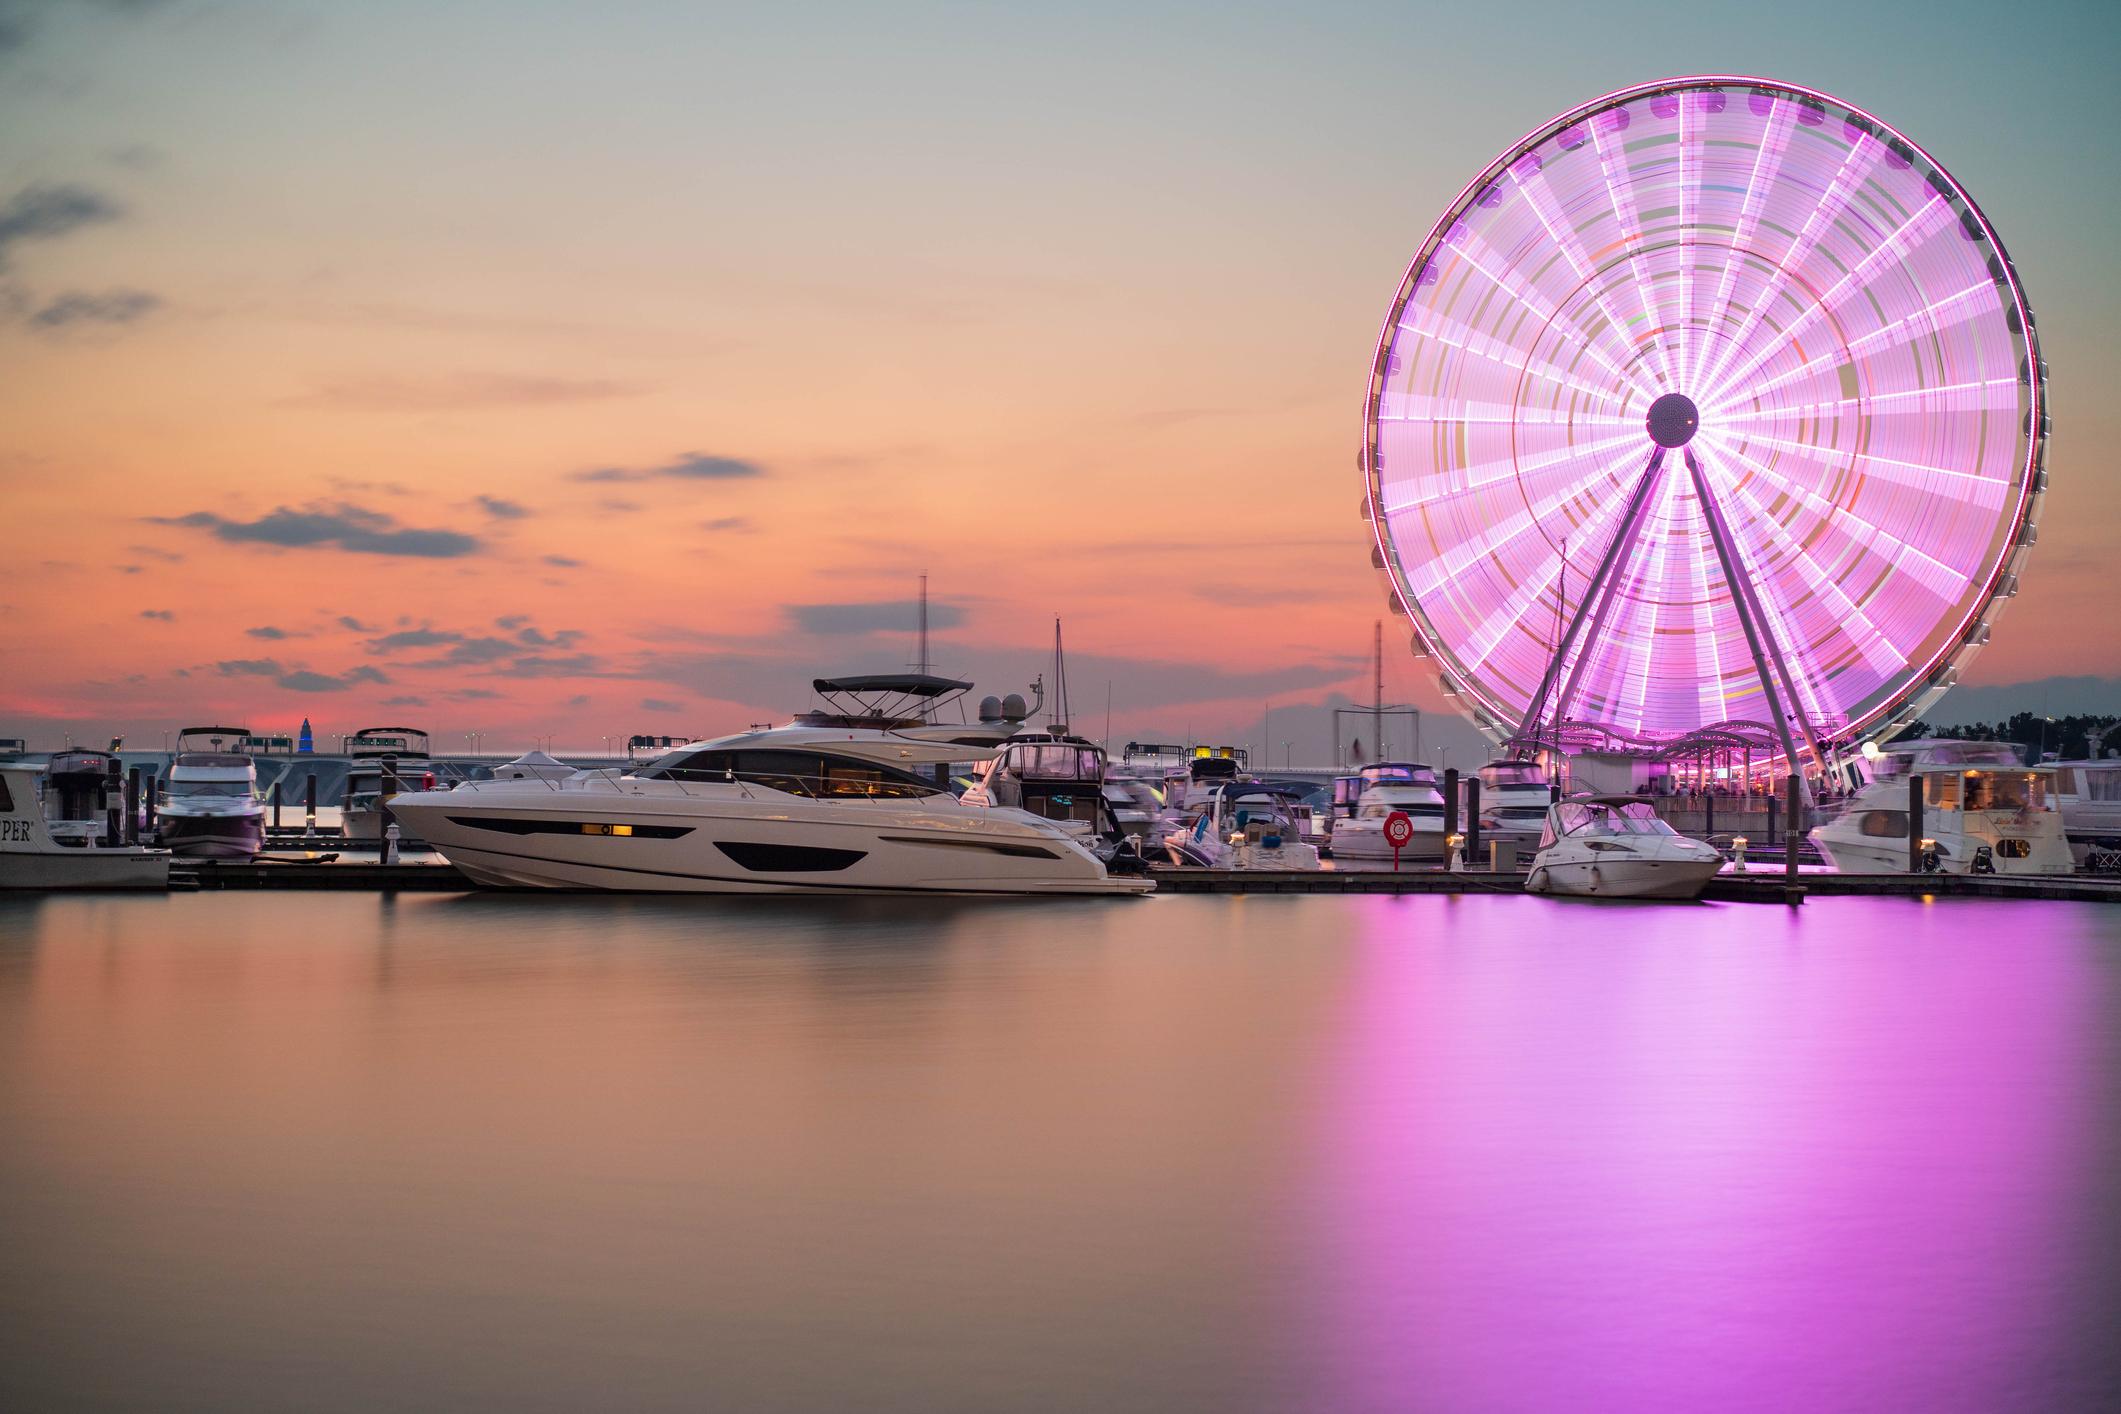 Bright pink Ferris wheel spinning